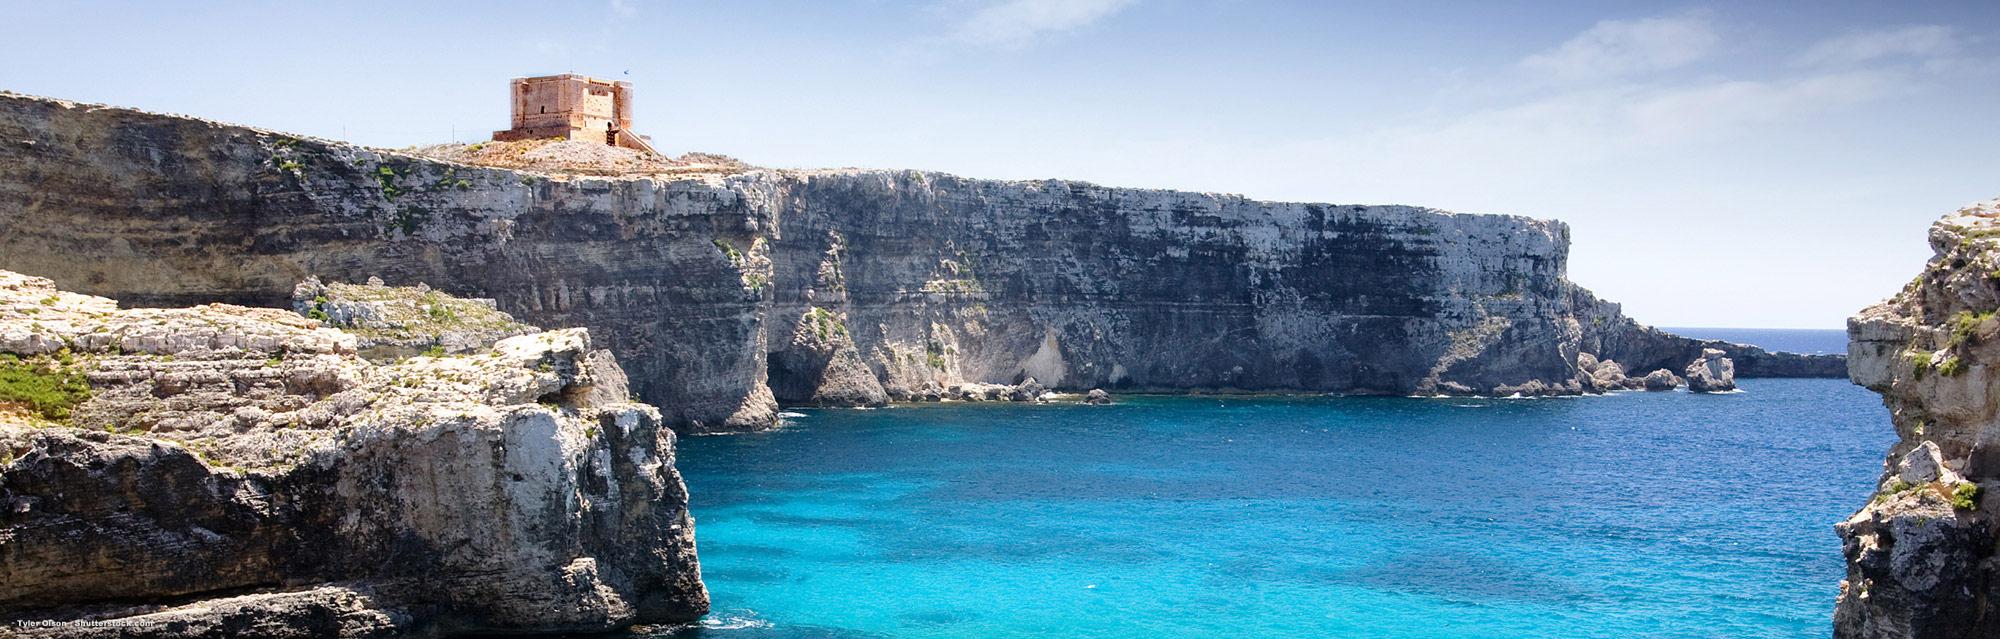 Cursos de inglés en la Isla de Gozo